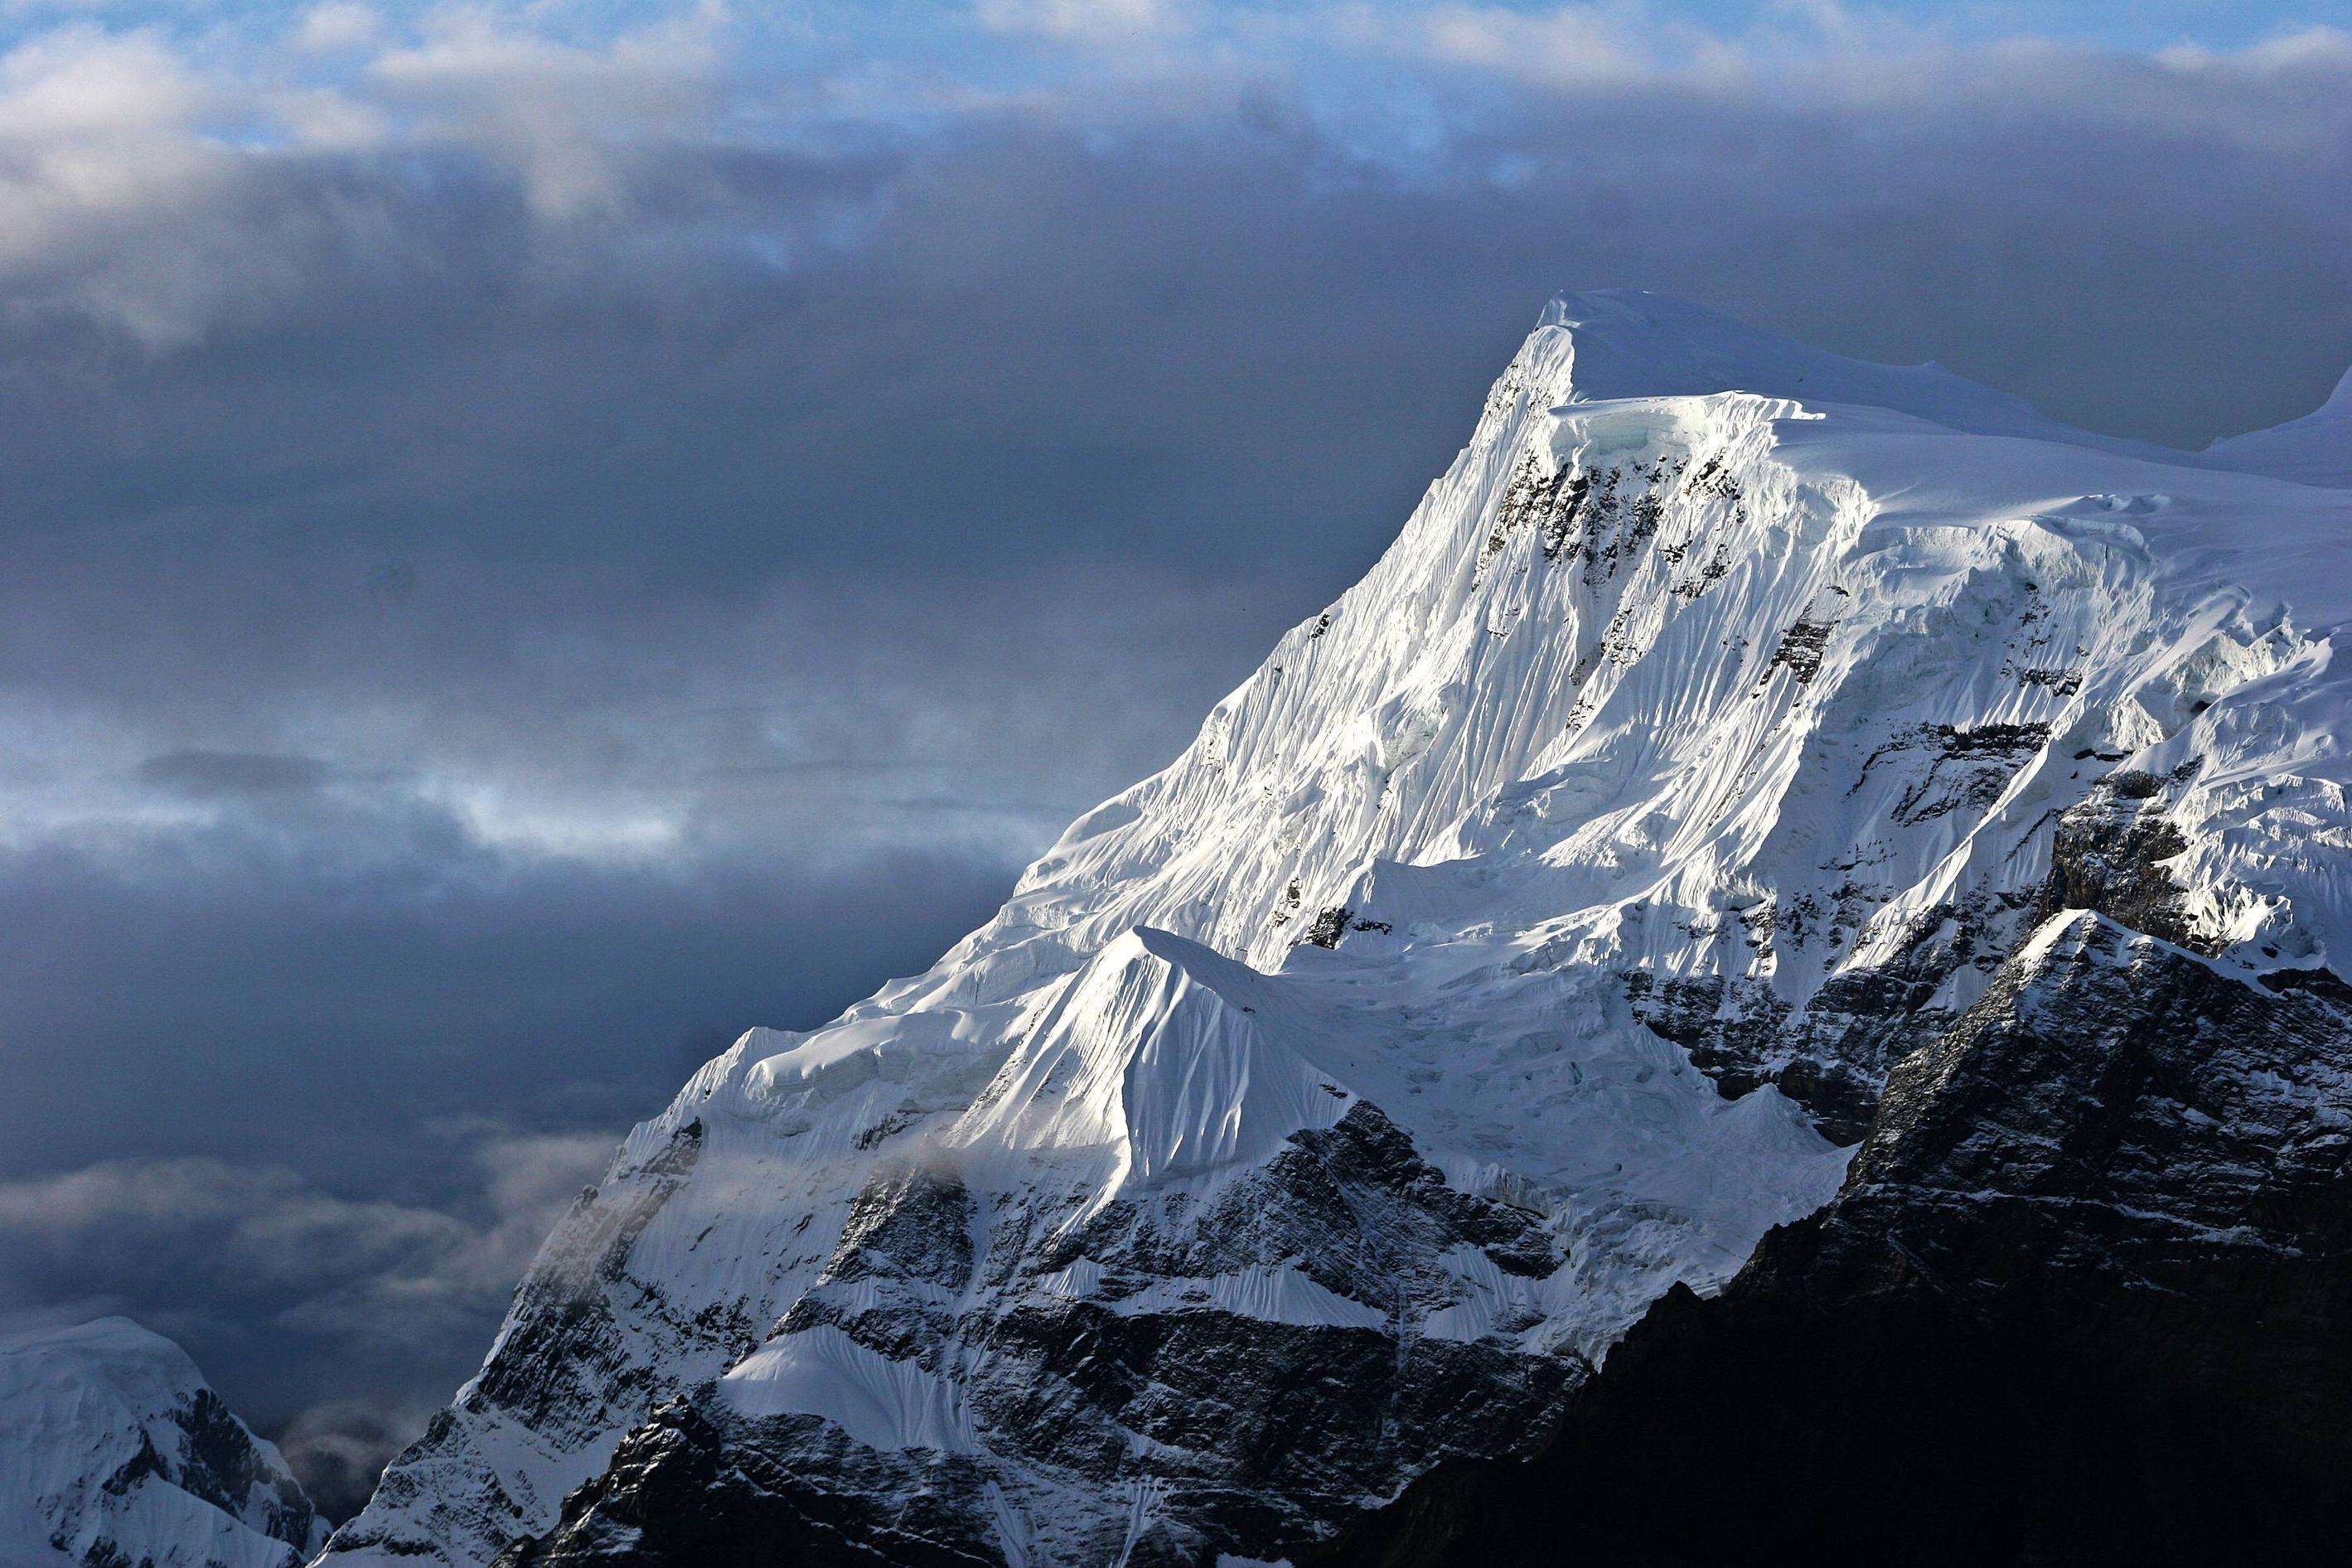 Annapurna Iii Taken From The Annapurna Circuit Nepal Mountain Wallpaper Mountain Landscape Mountain Images